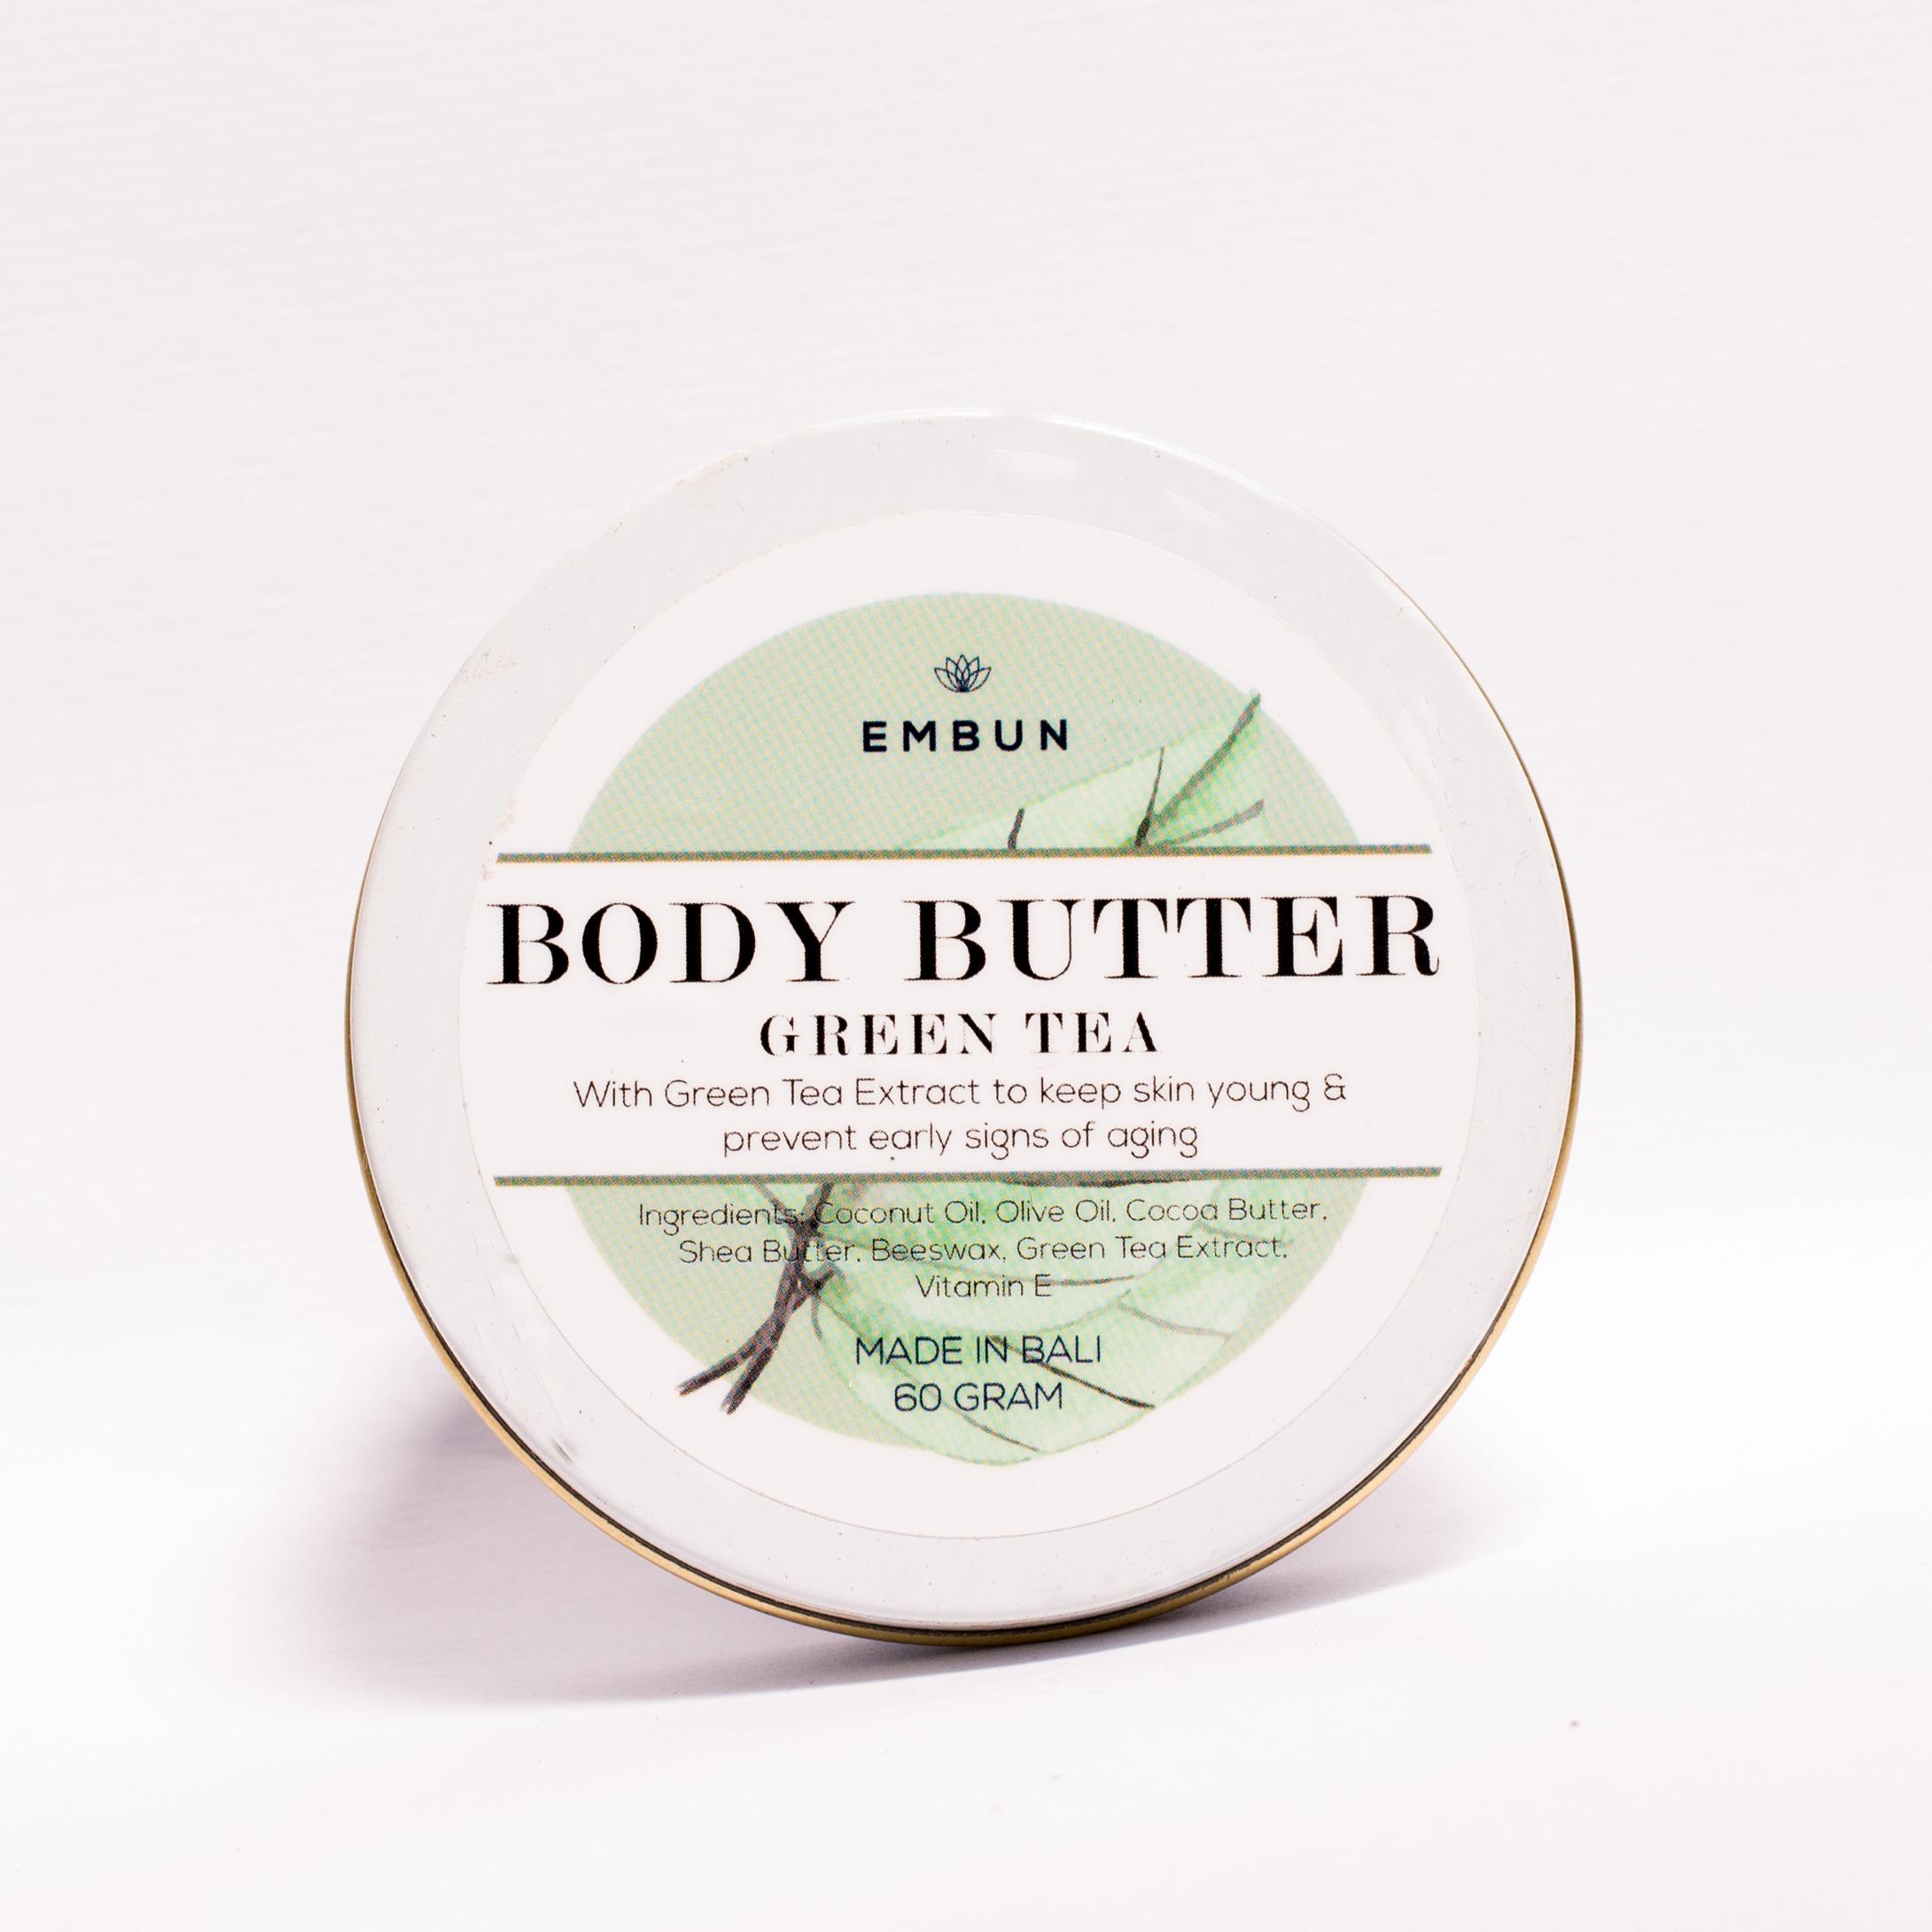 Embun Body Butter Anti-aging Green Tea